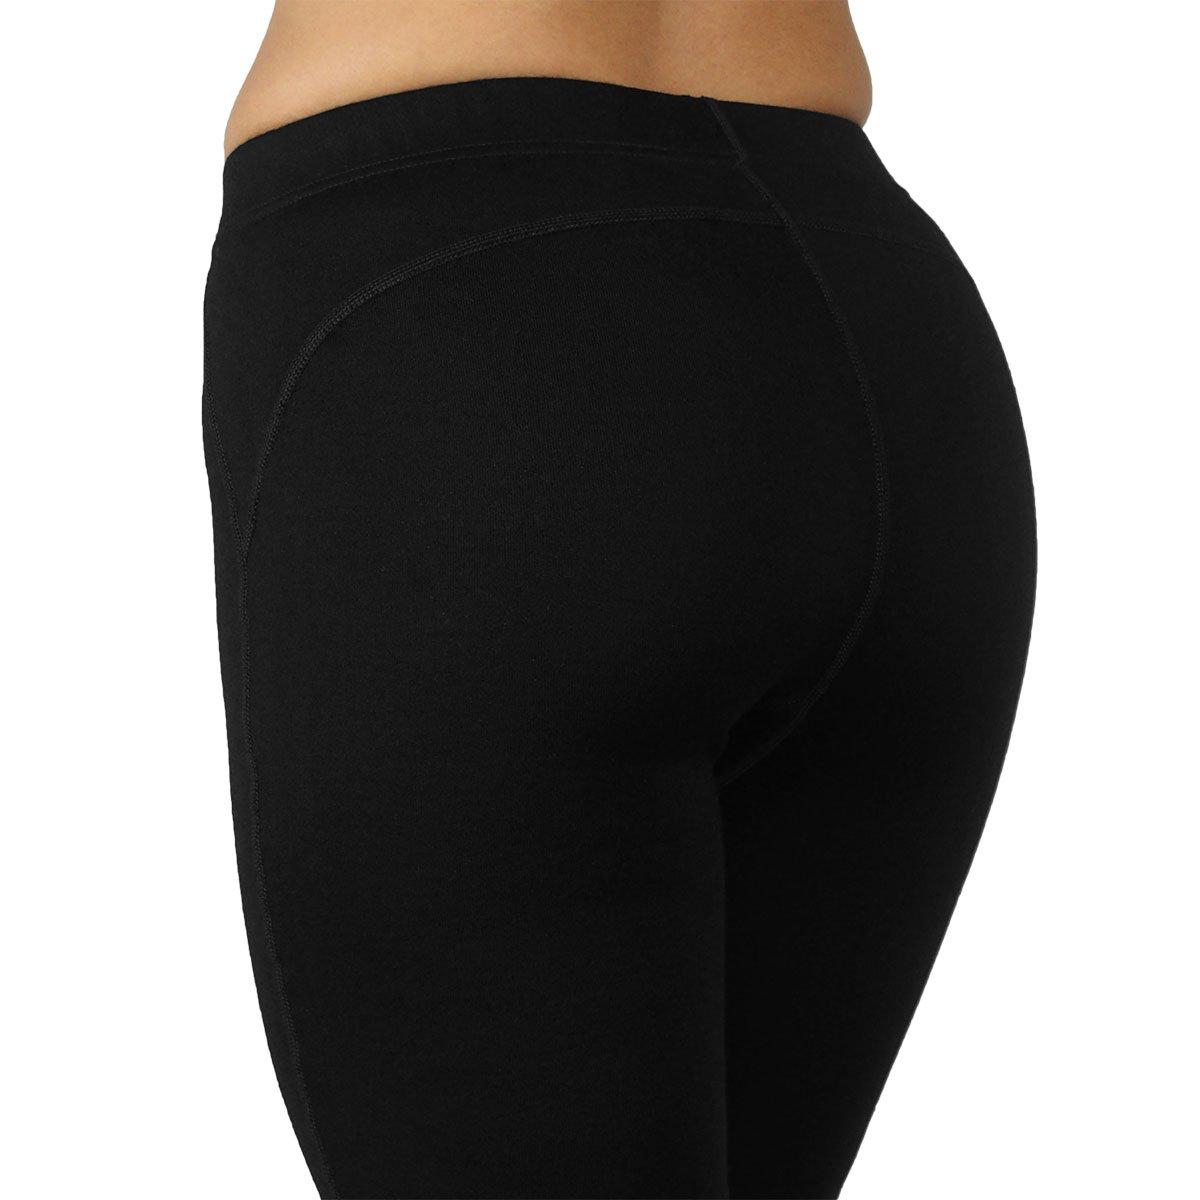 Minus33 Merino Wool 2300 Woolverino Women's Micro Weight Leggings Black Large by Minus33 Merino Wool (Image #7)